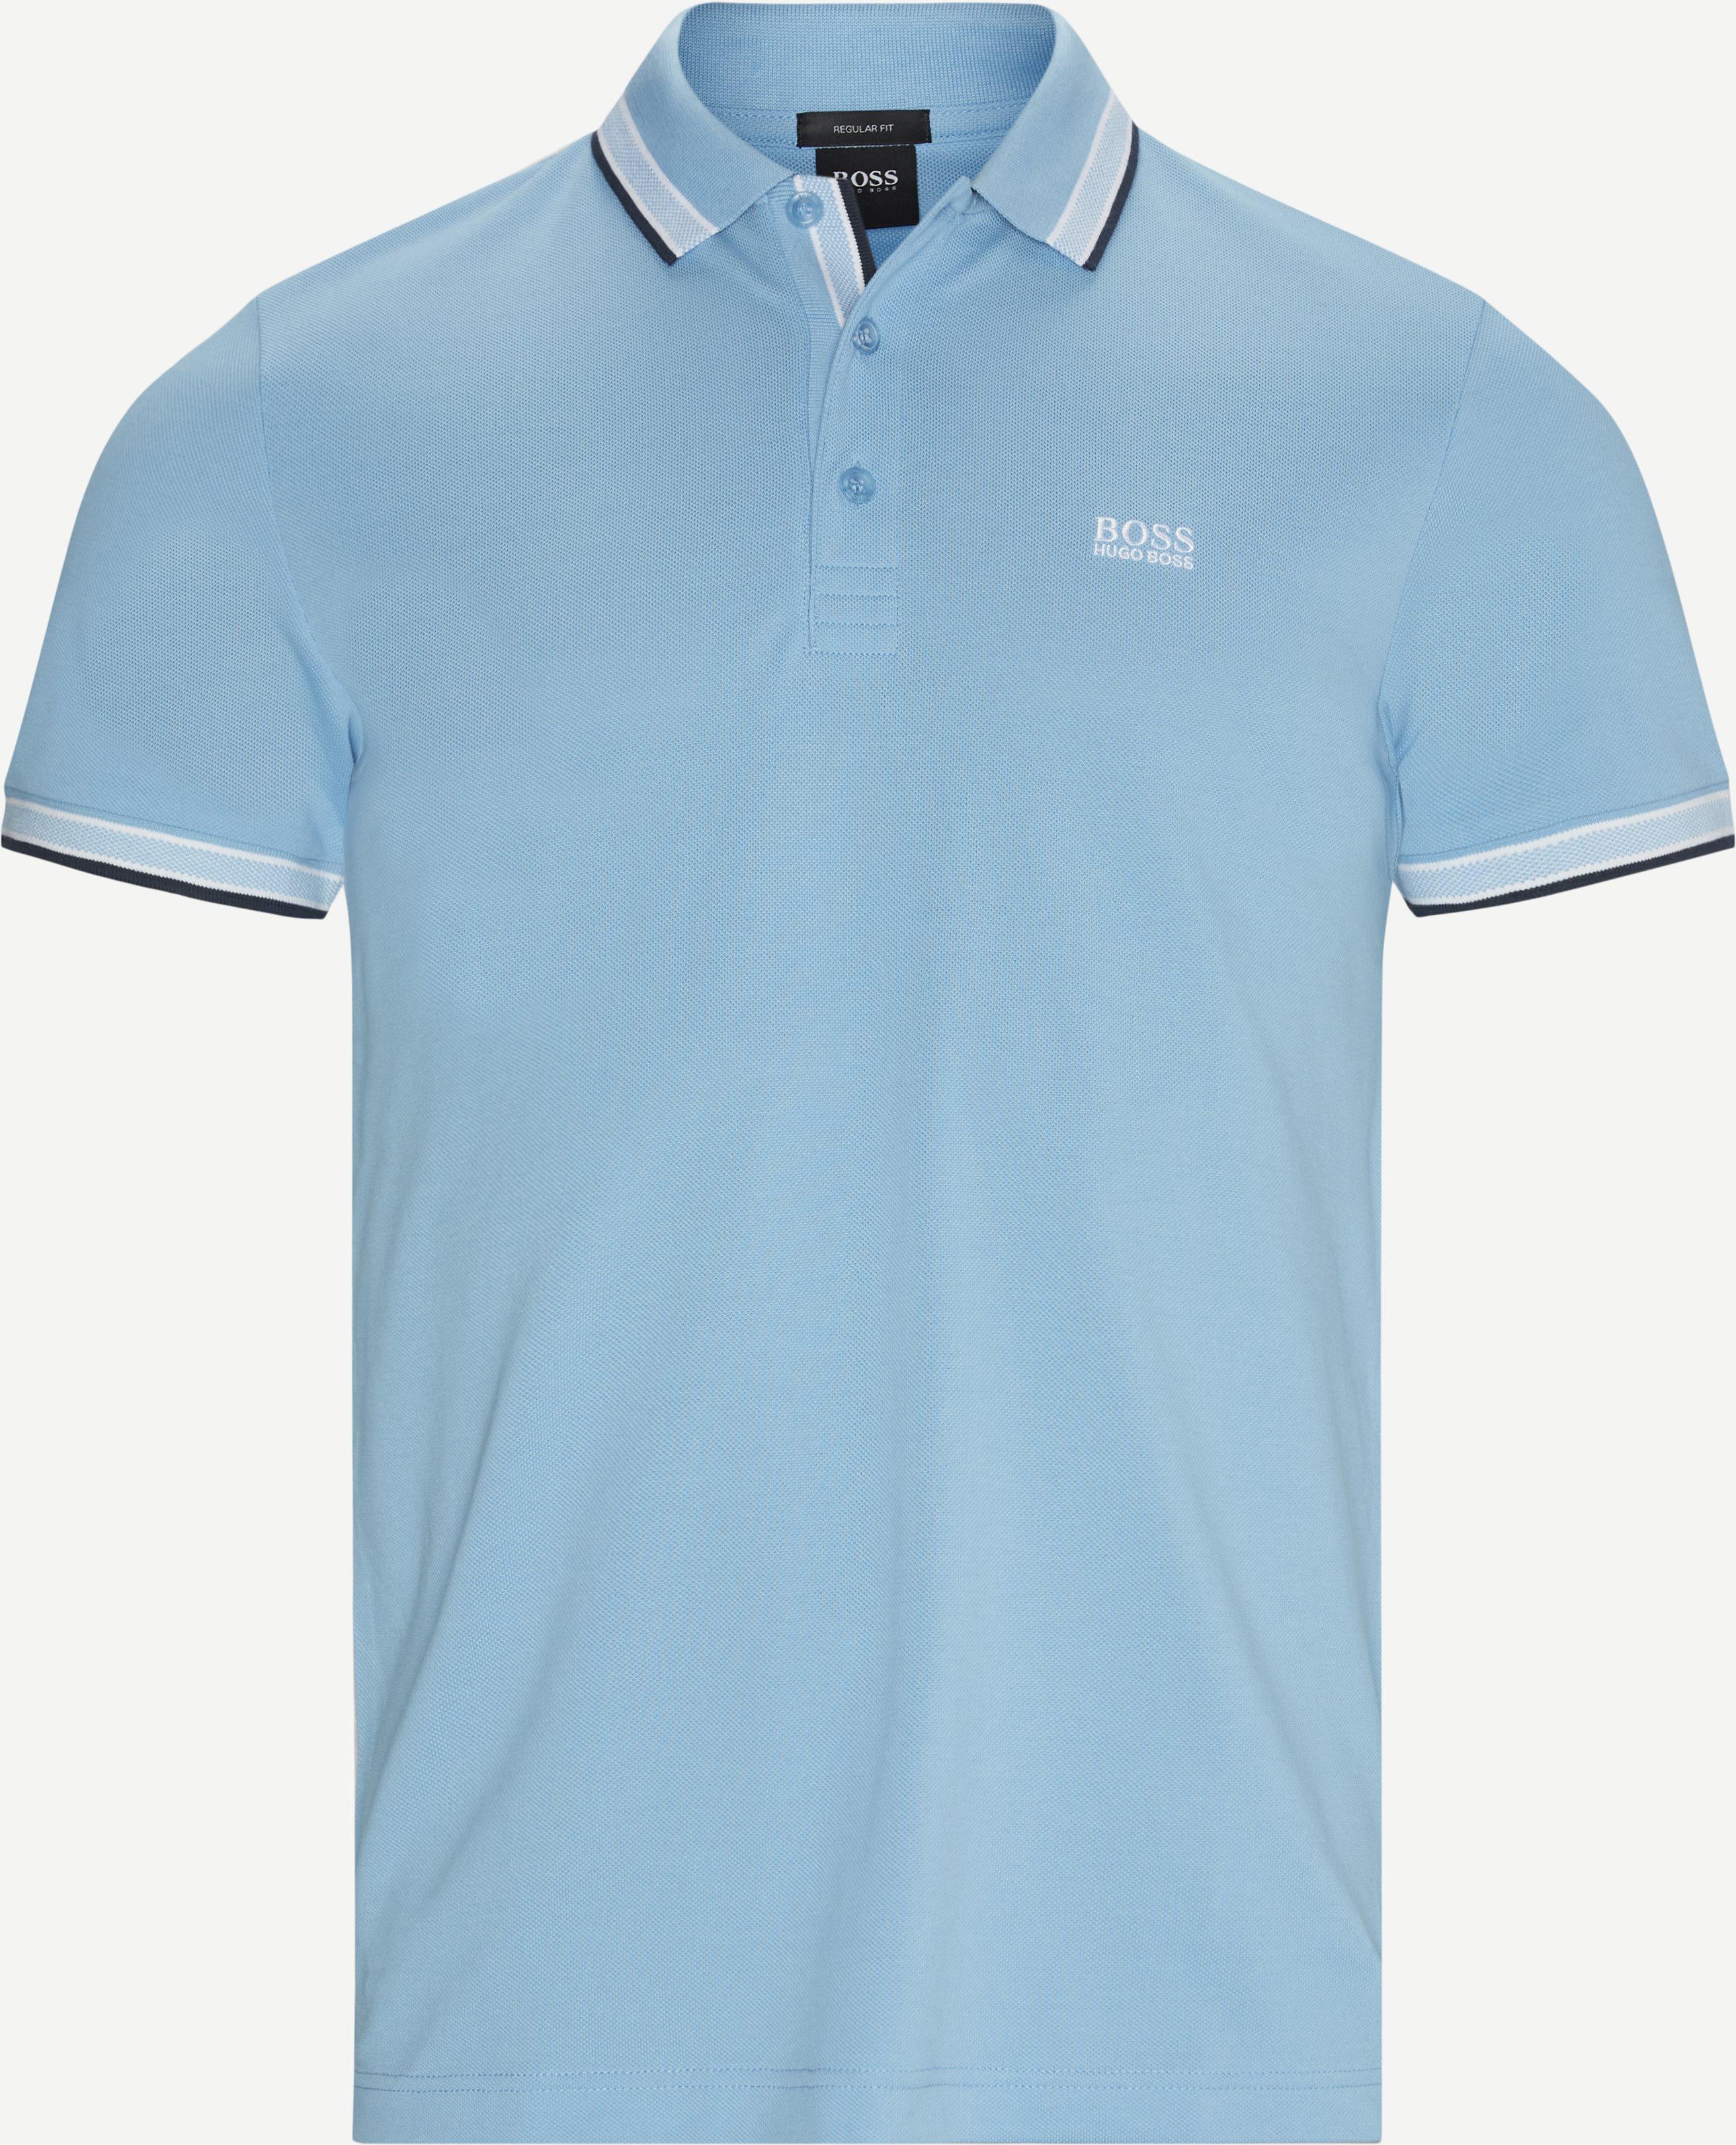 T-Shirts - Regular - Blau